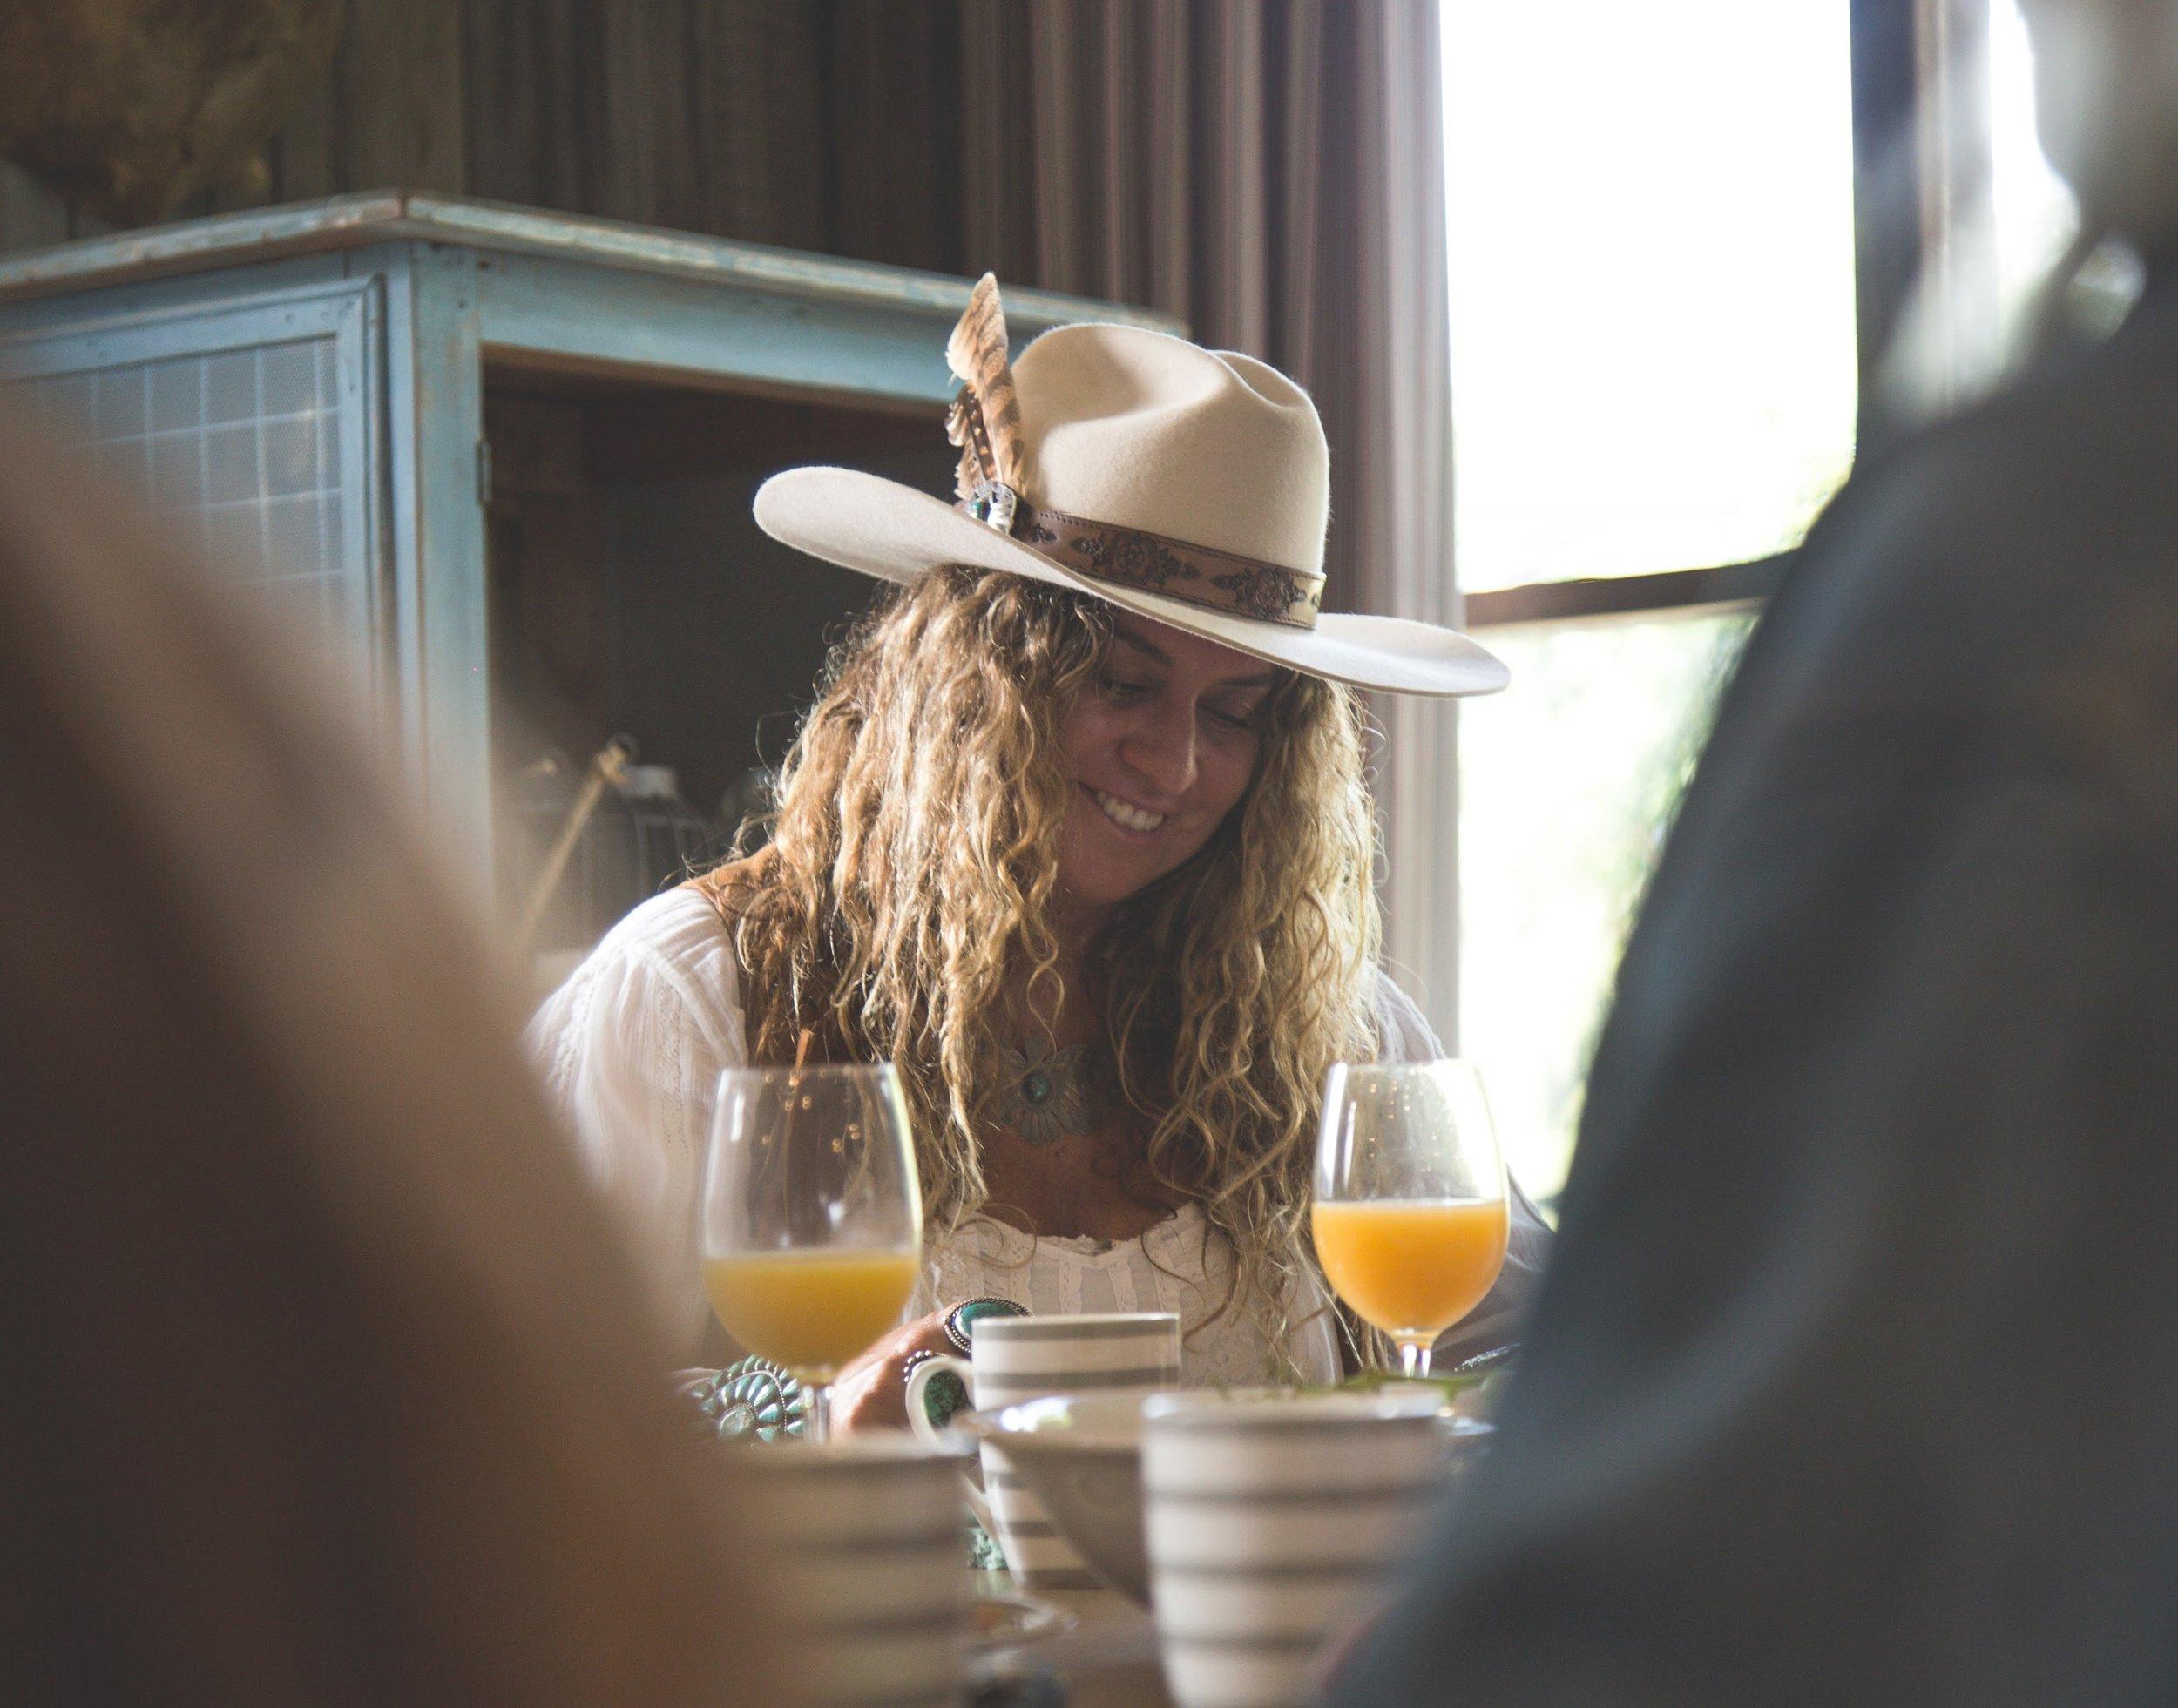 20180310_ABAdur_The Ranch Byron Bay New Edit_012.jpg